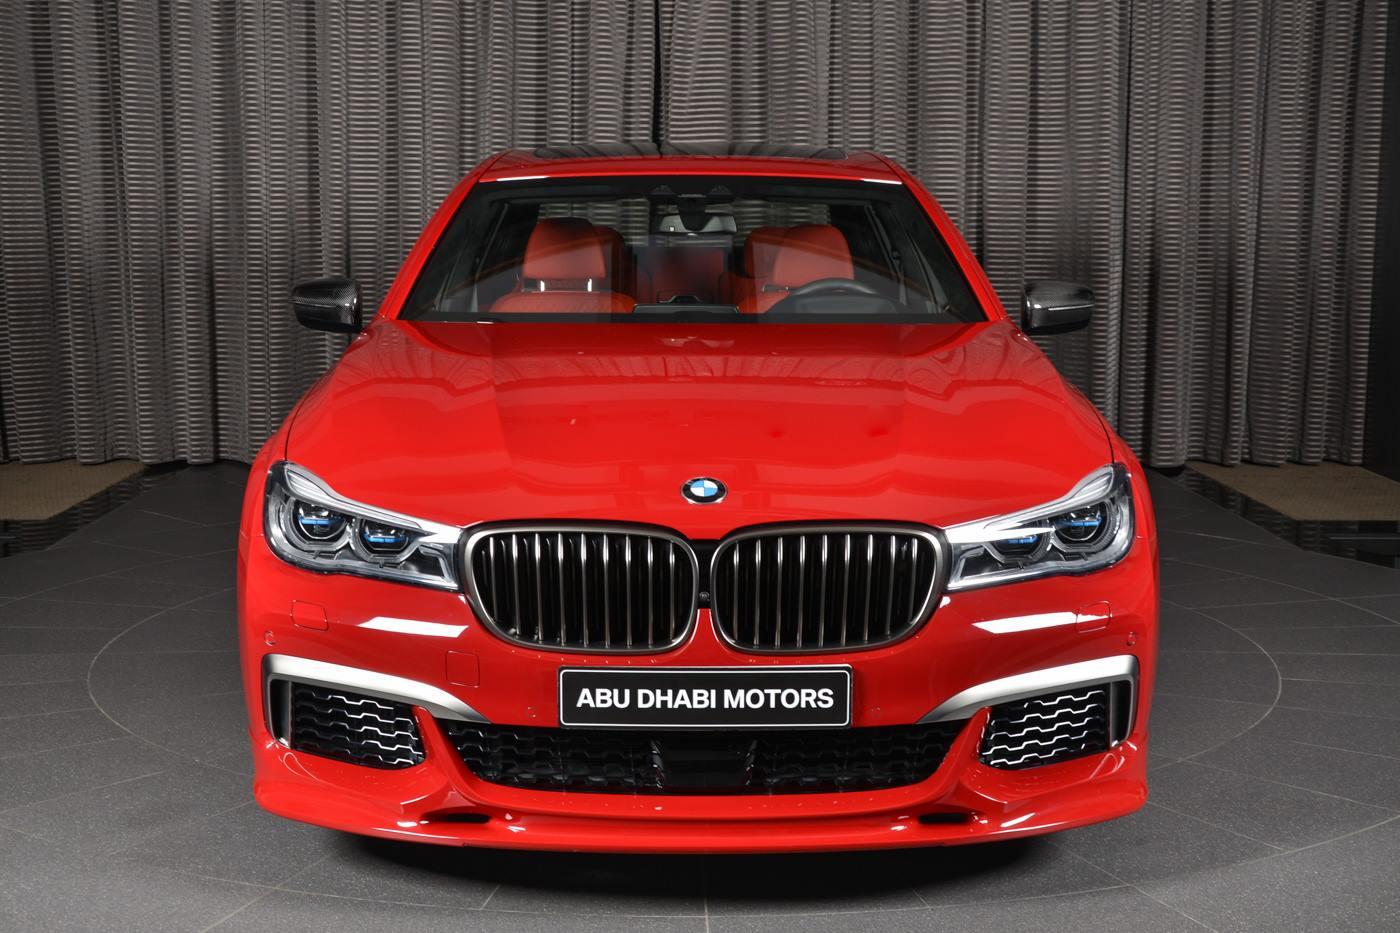 Imola Red BMW M760Li in Abu Dhabi Has Everything ...